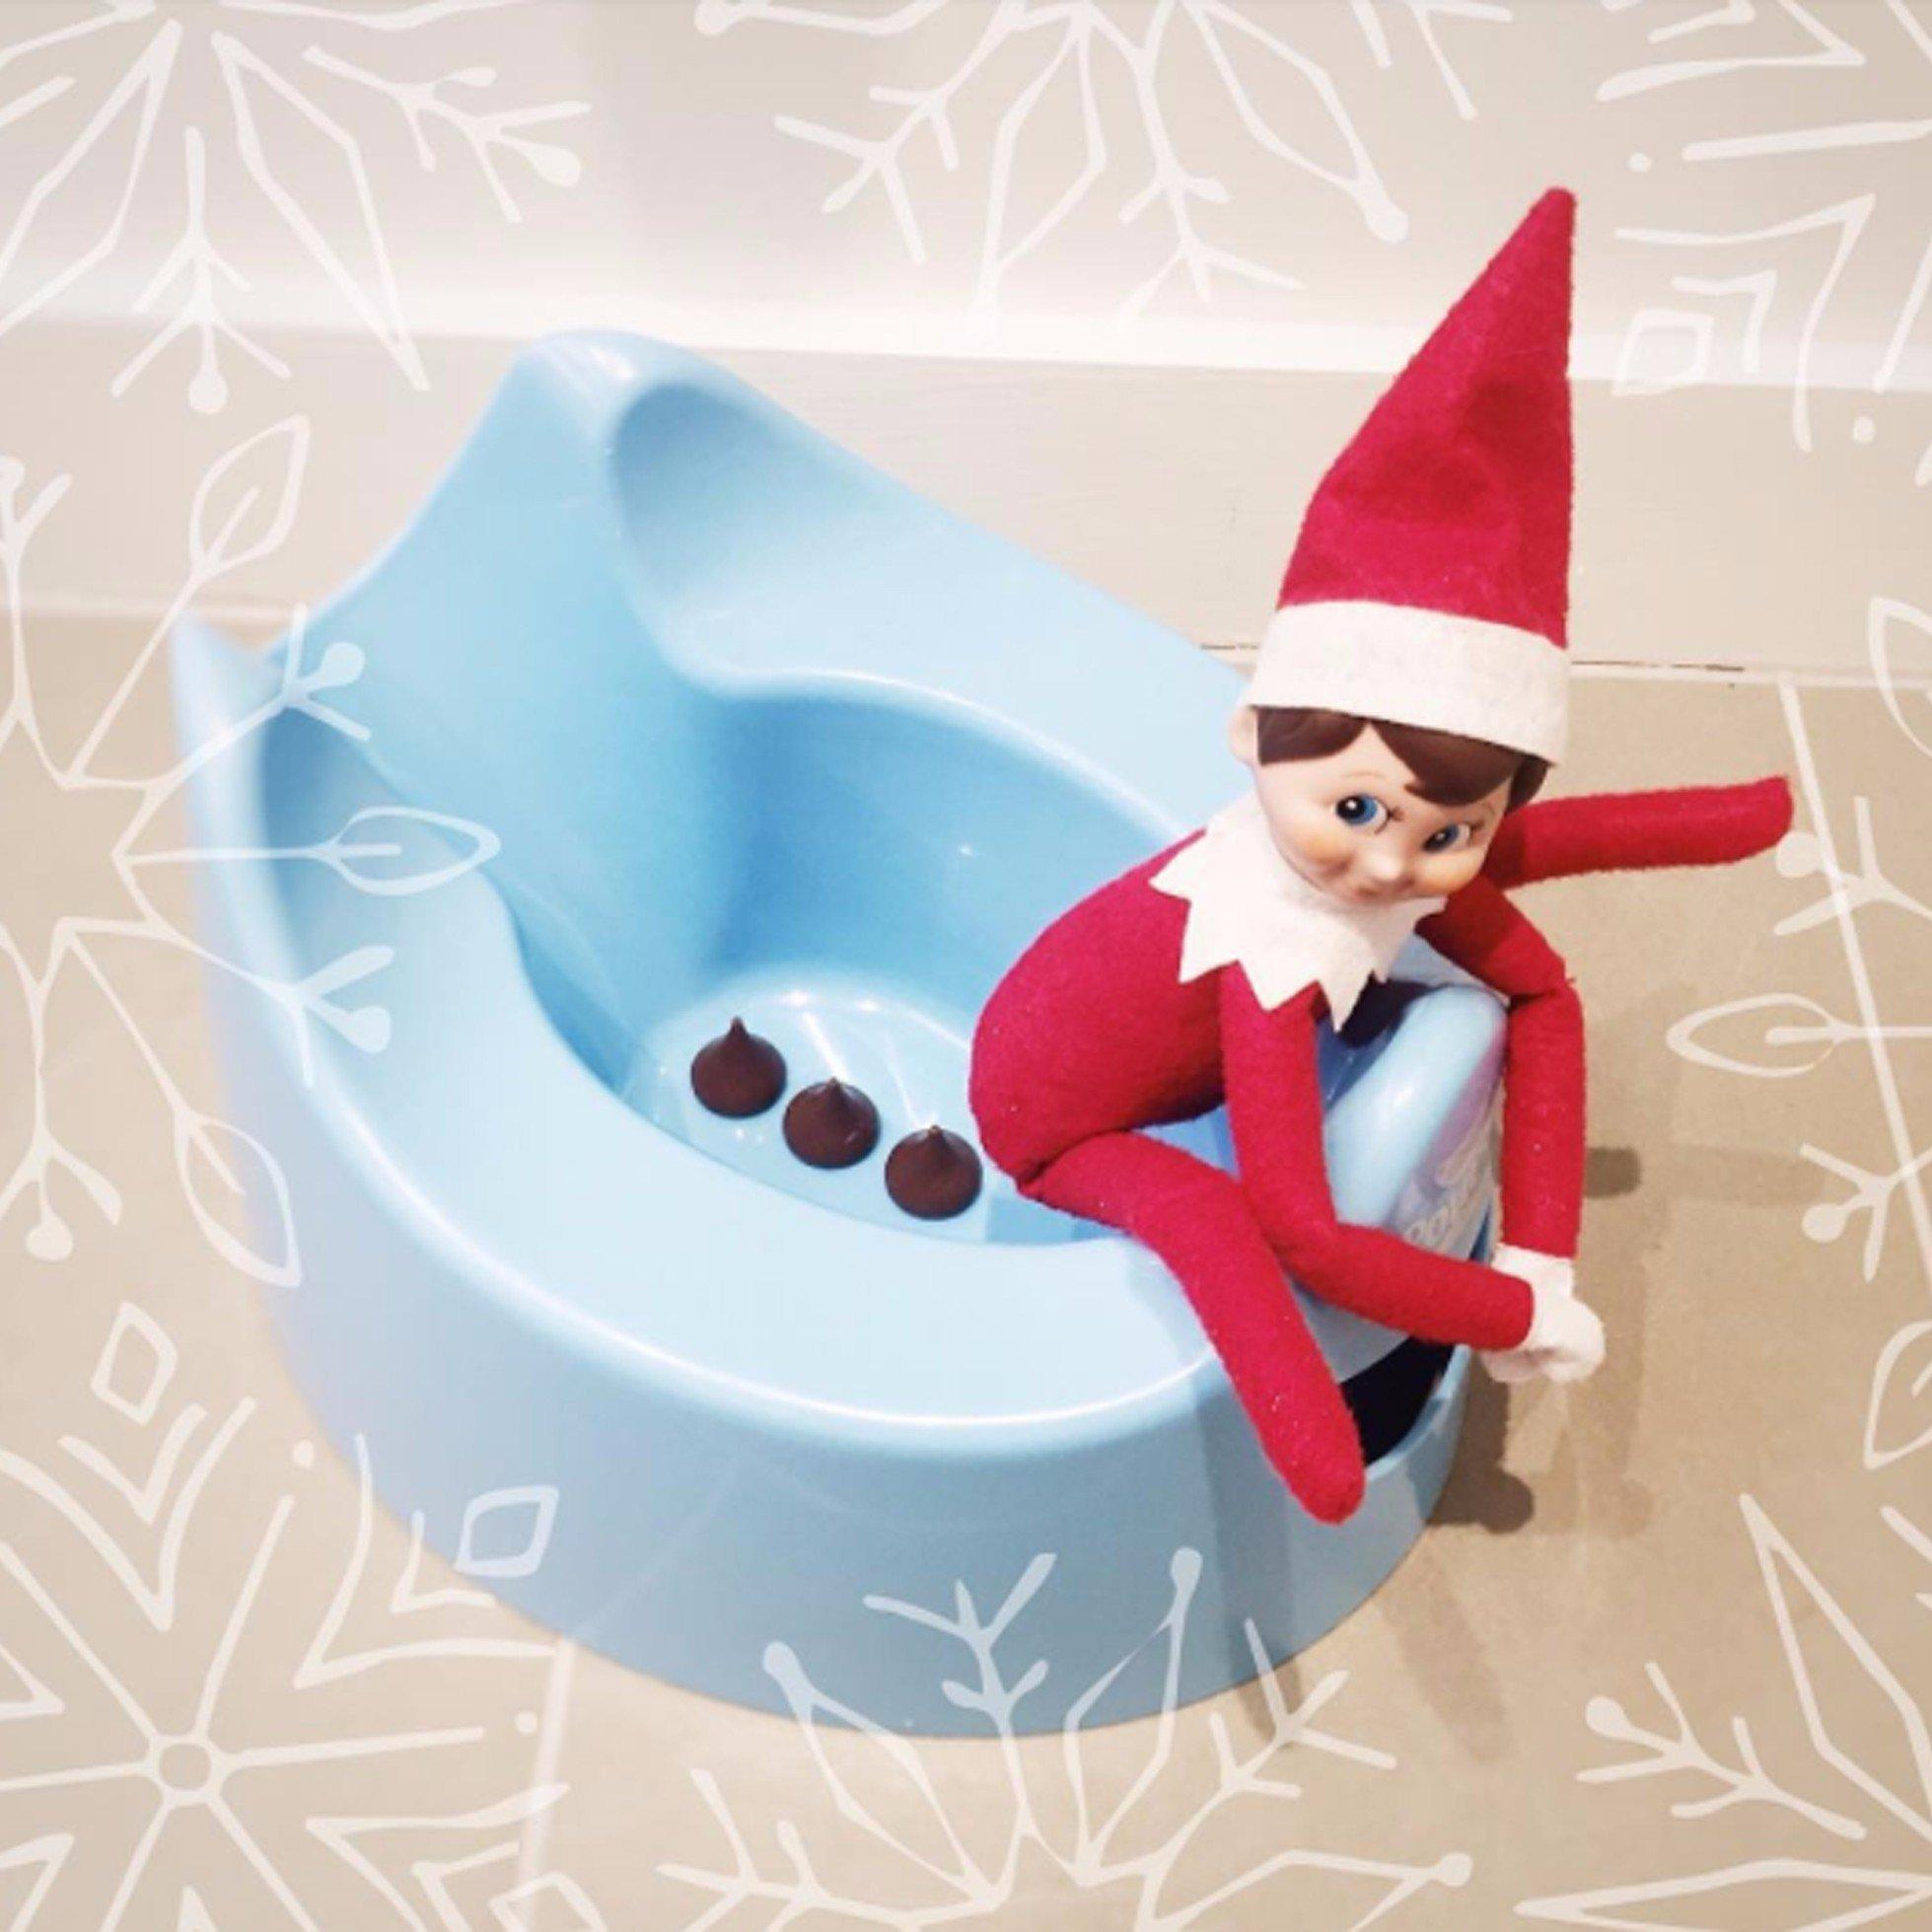 10 Stylish Funny Elf On The Shelf Ideas funny elf on the shelf ideas popsugar smart living uk 3 2021